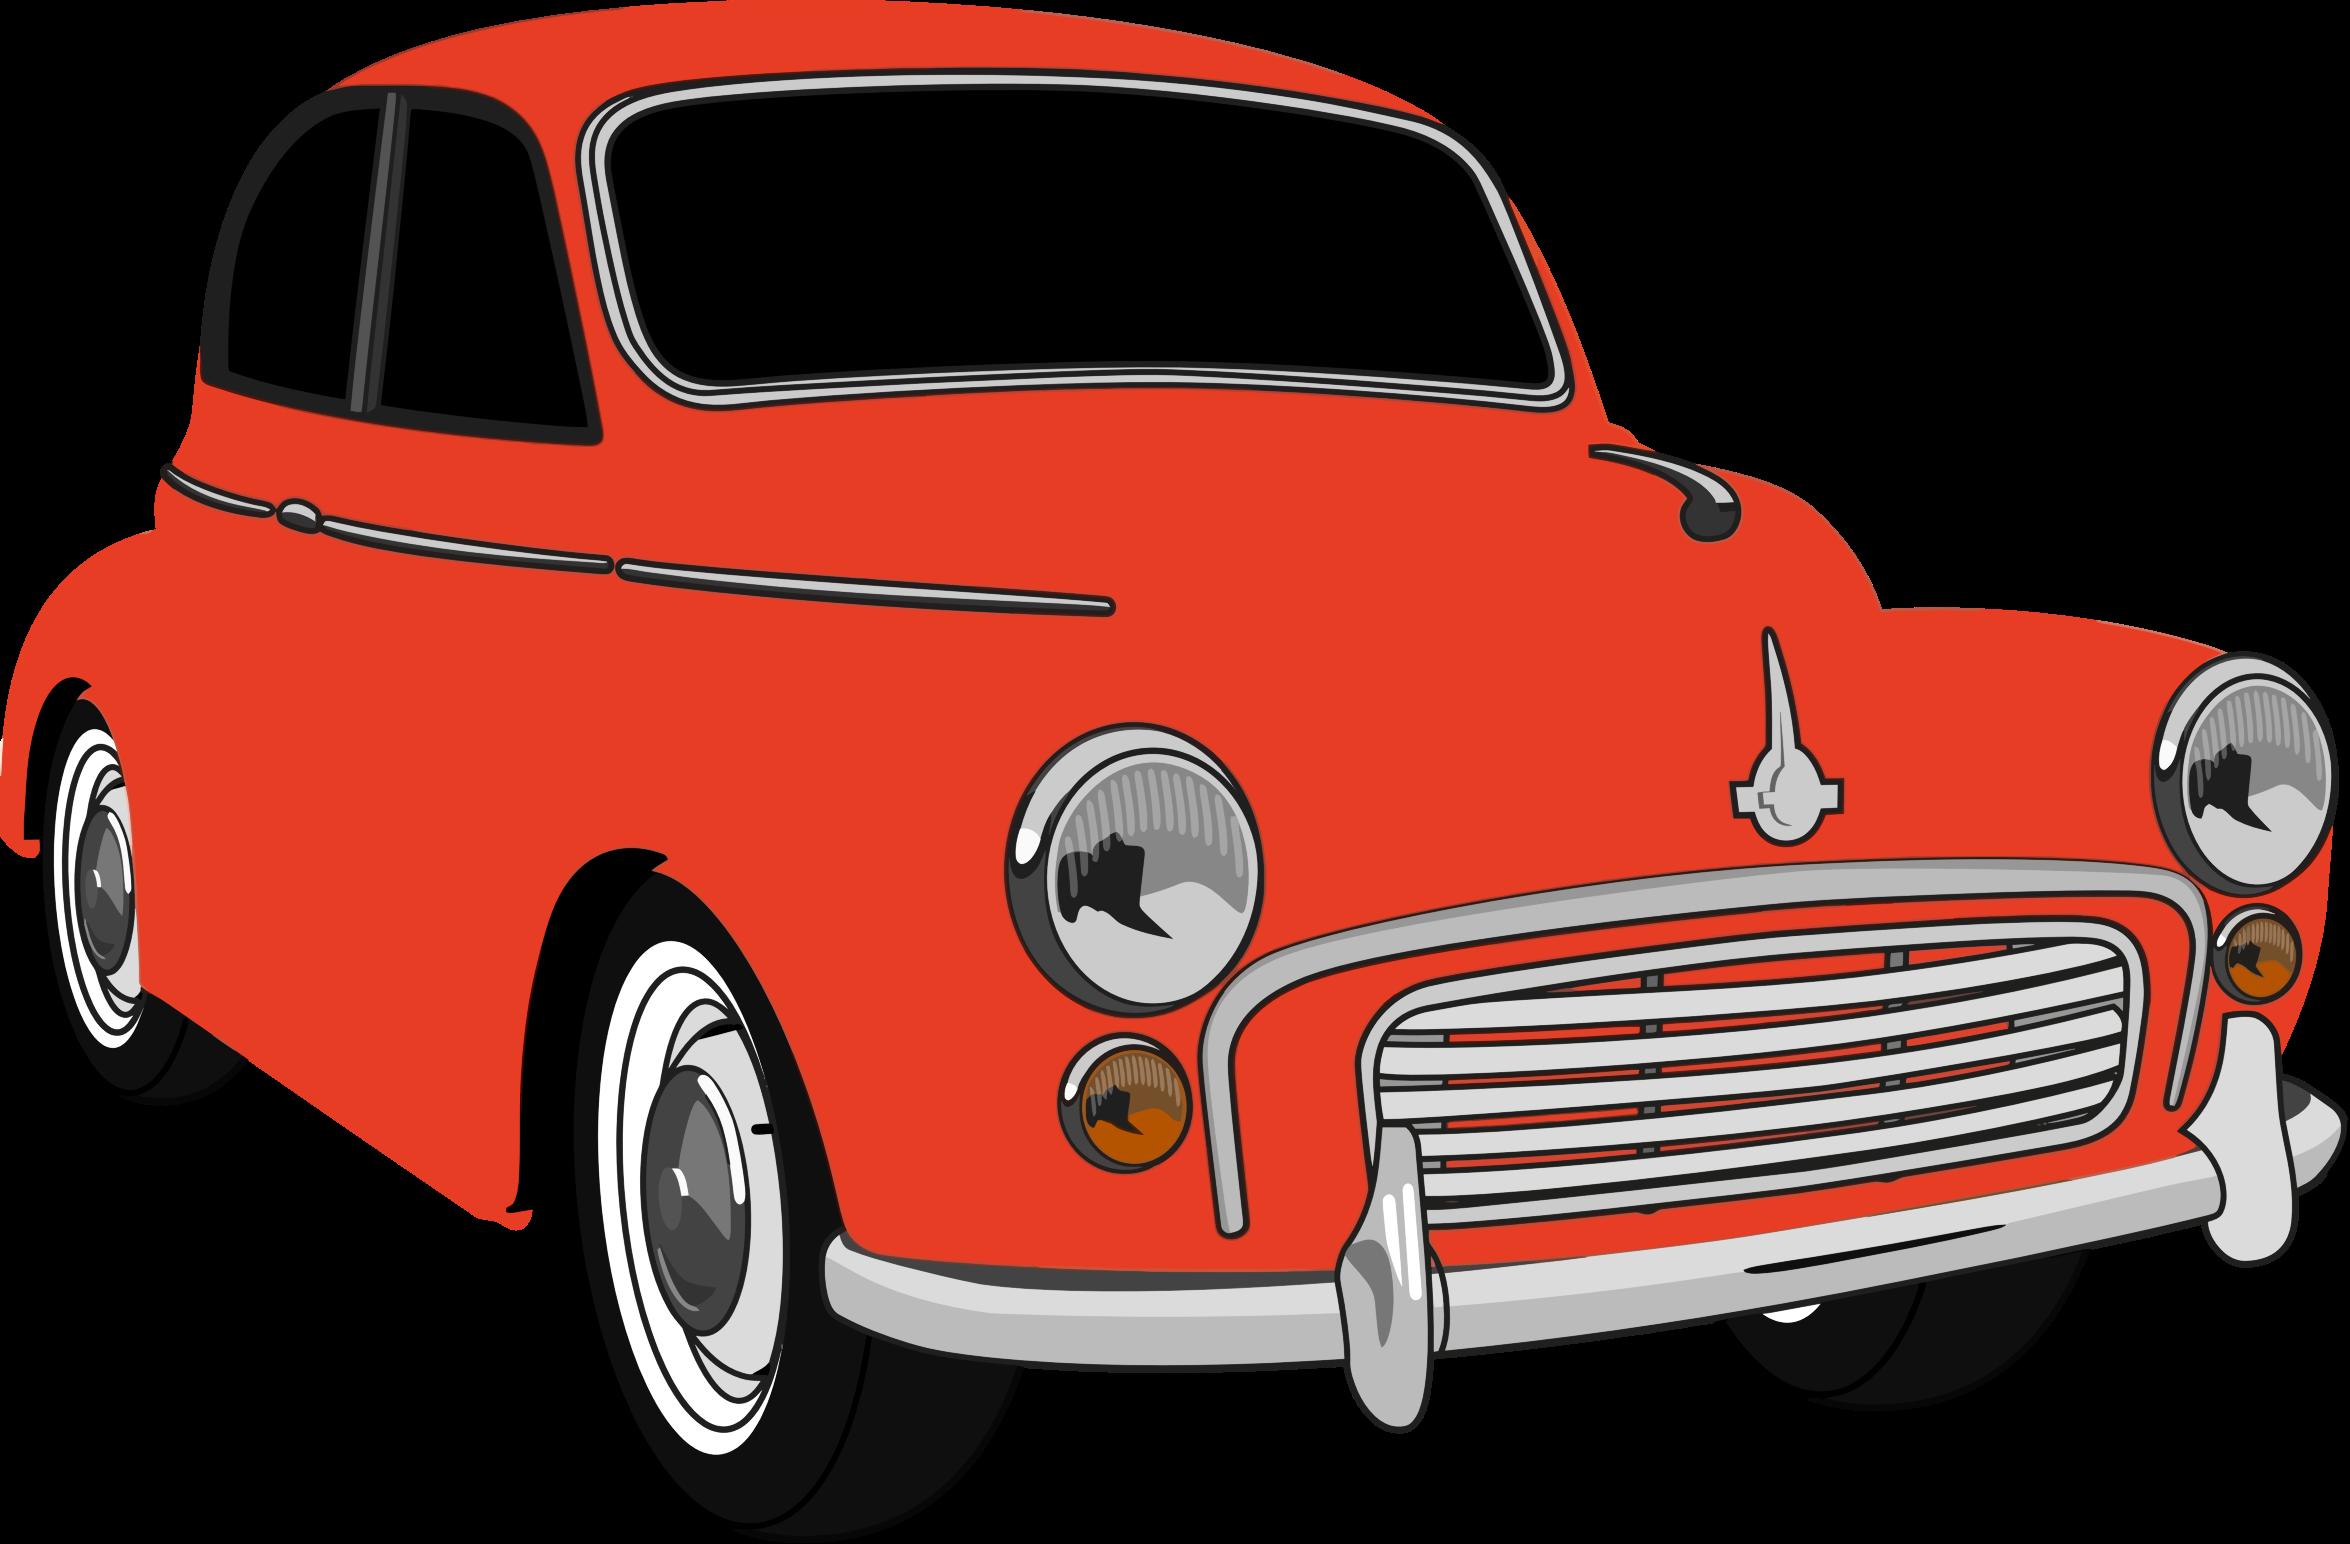 Red classic car clipart clip transparent library Clipart - Classic Red Car clip transparent library